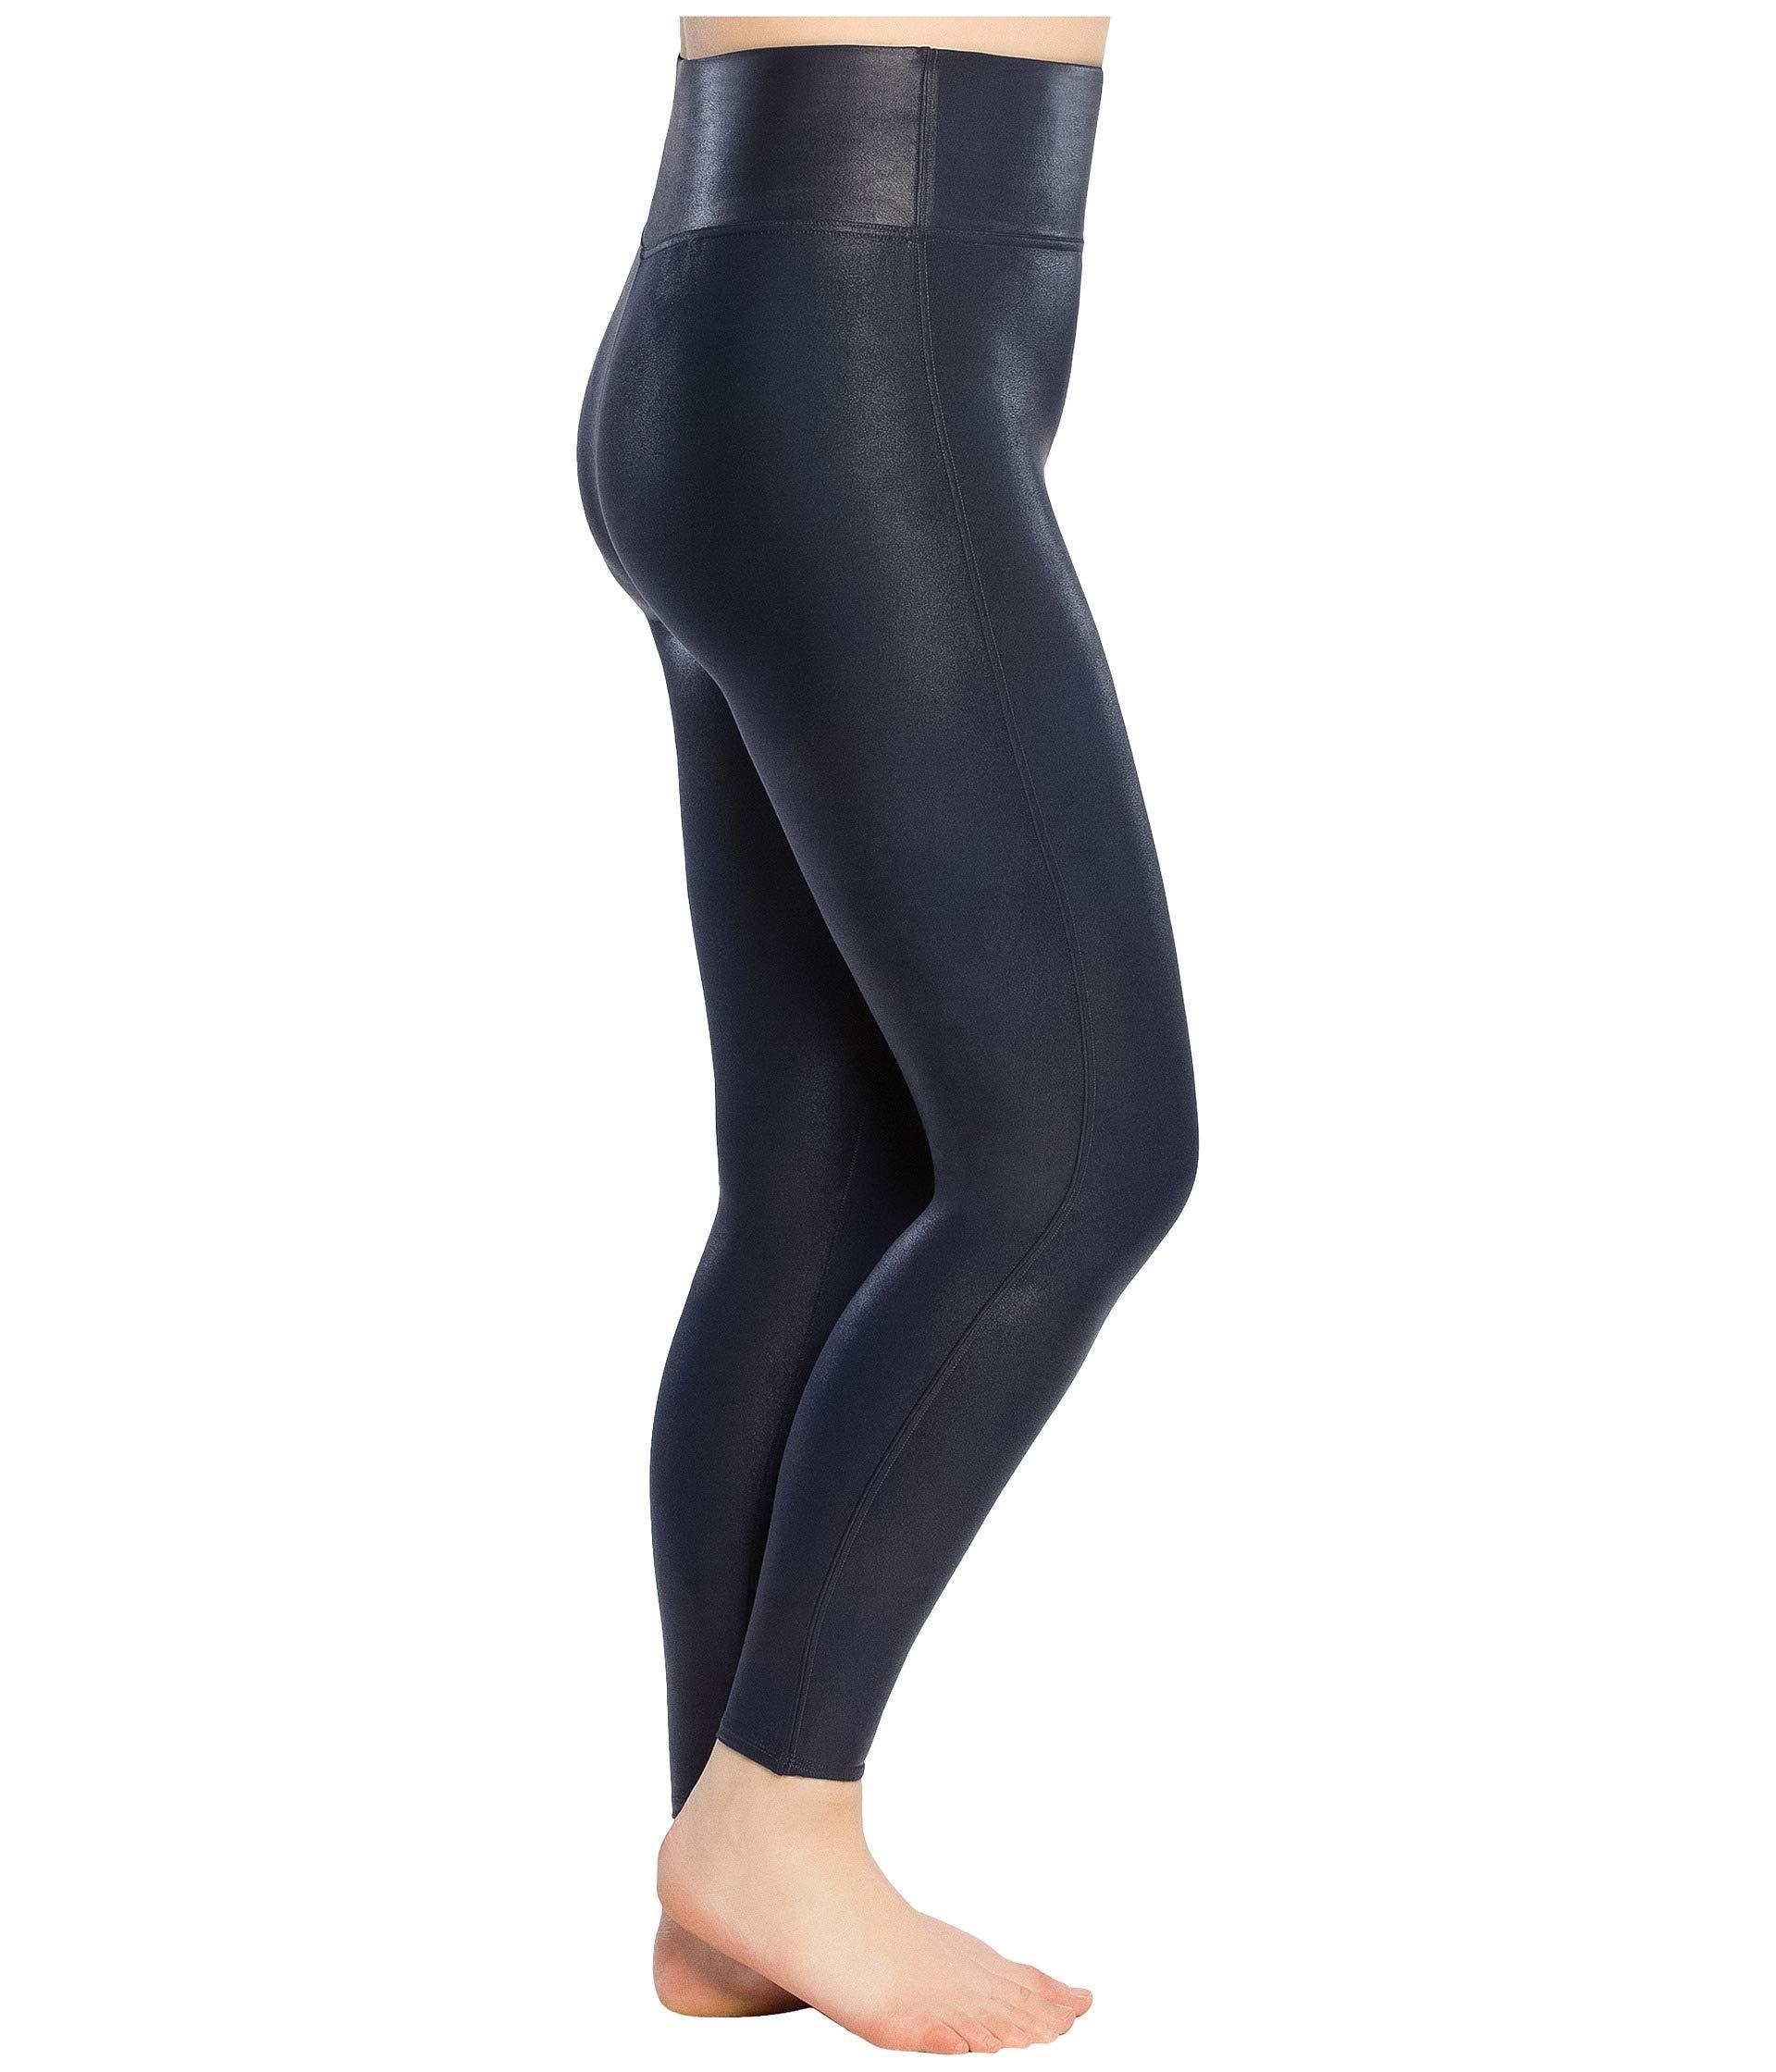 28358d7d7da Lyst - Spanx Plus Size Faux Leather Leggings (gunmetal) Women s Clothing in  Blue - Save 45%